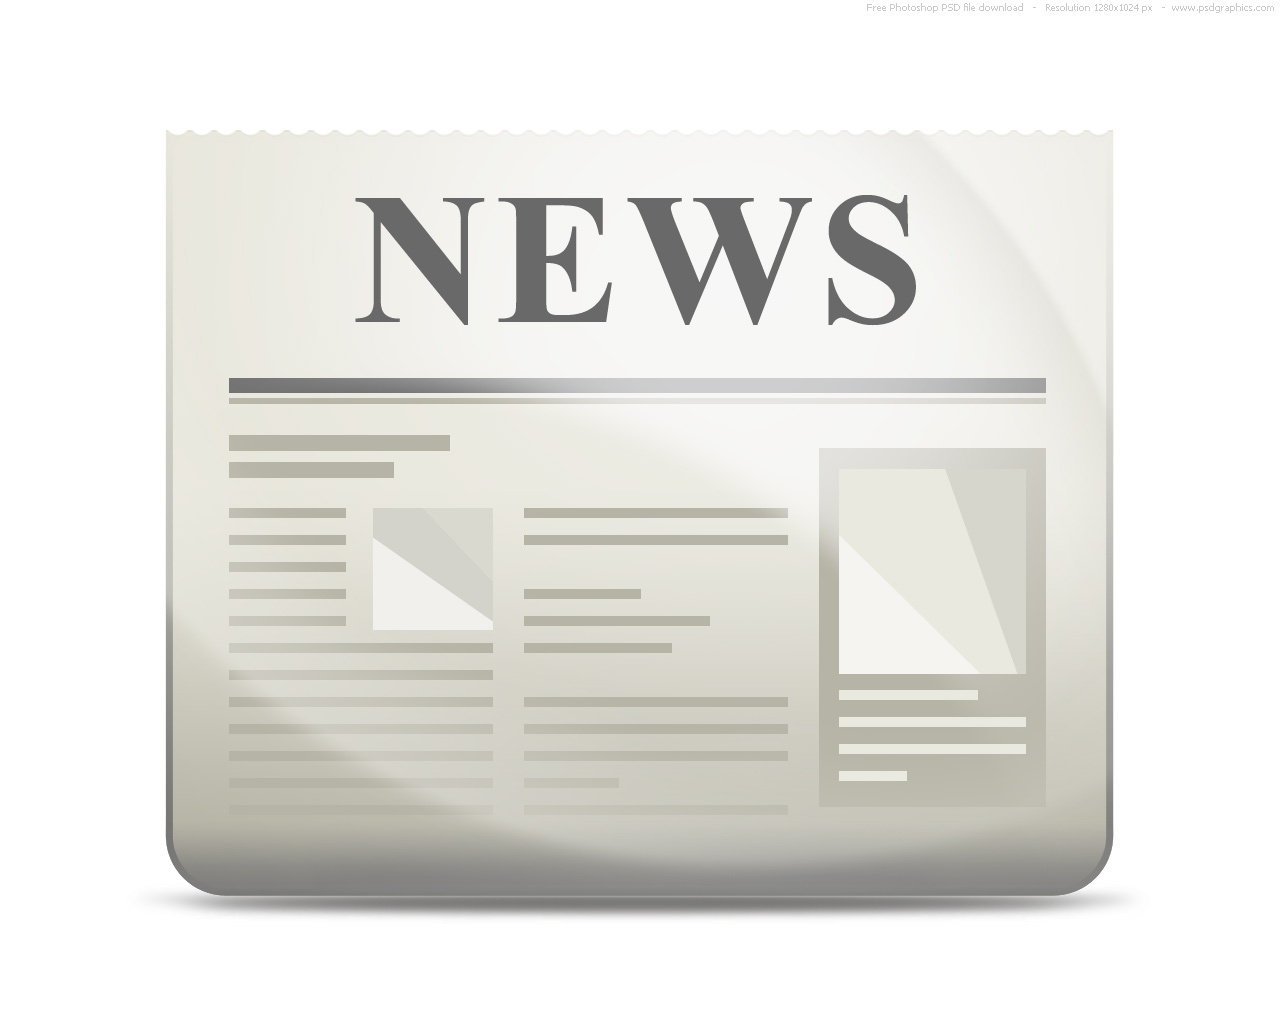 Newspaper Psd a newspaper  download PSD